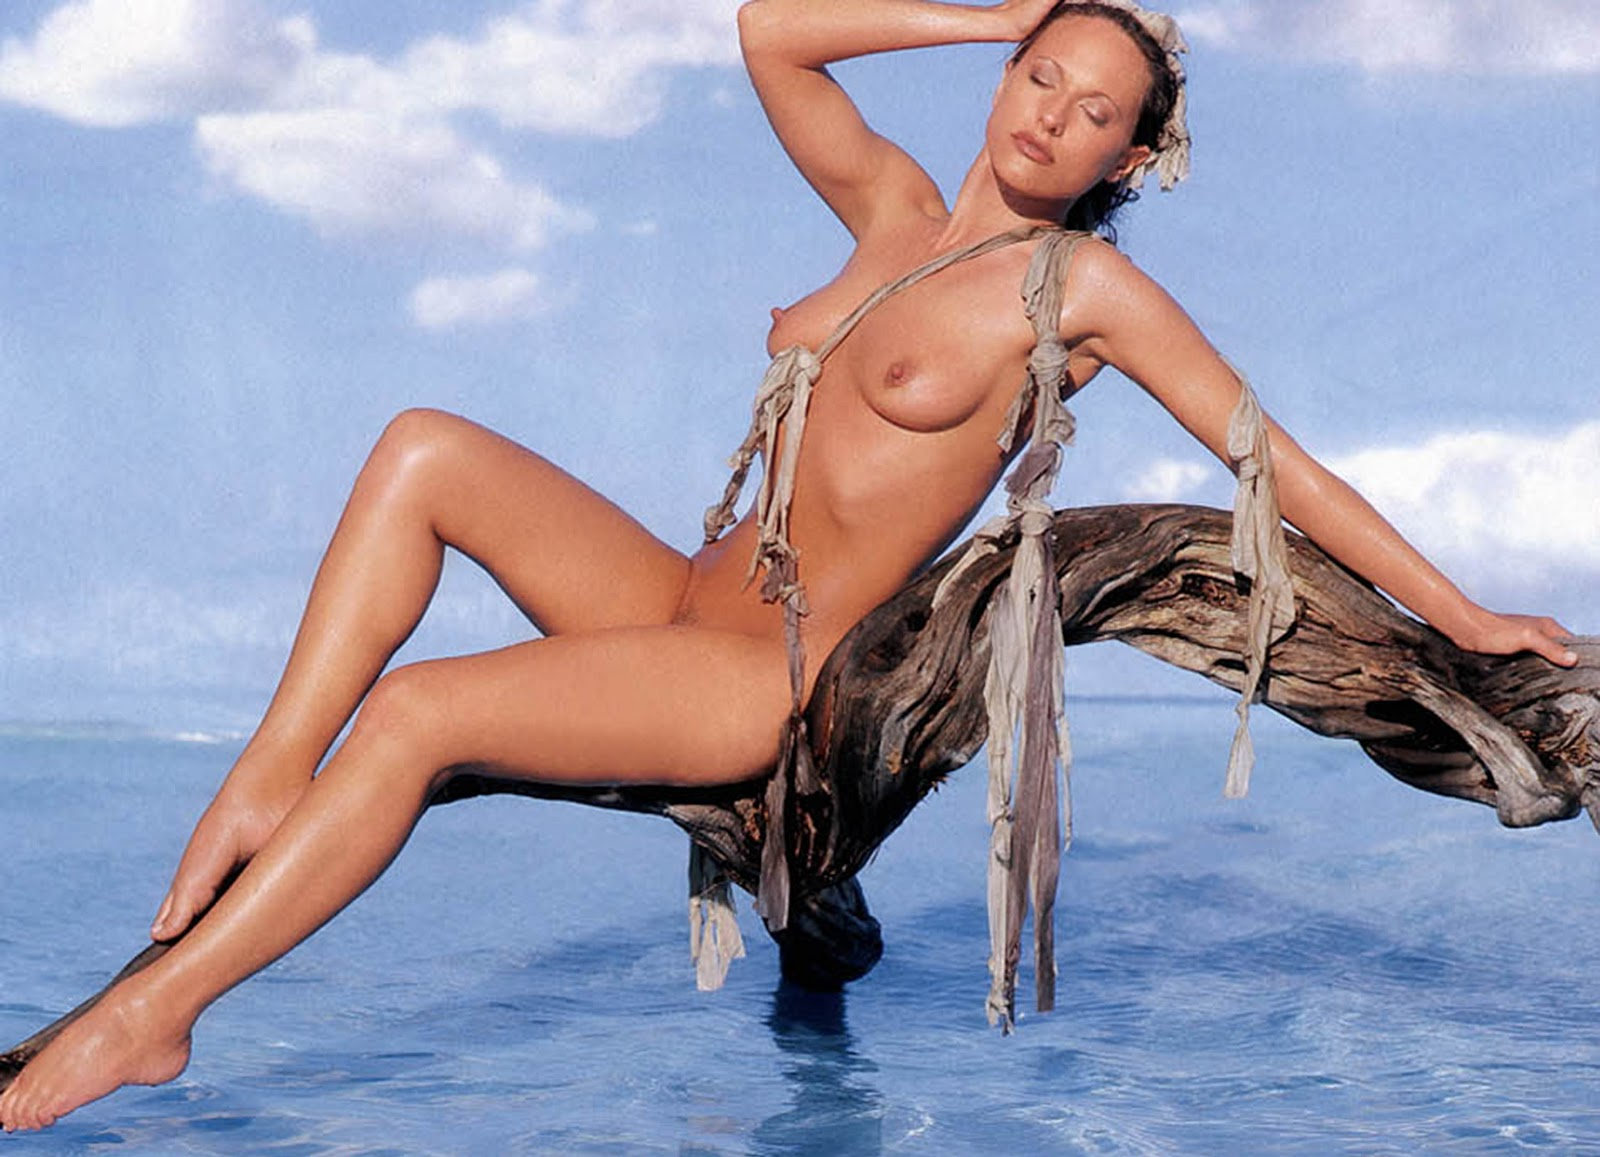 babes of survivor nude